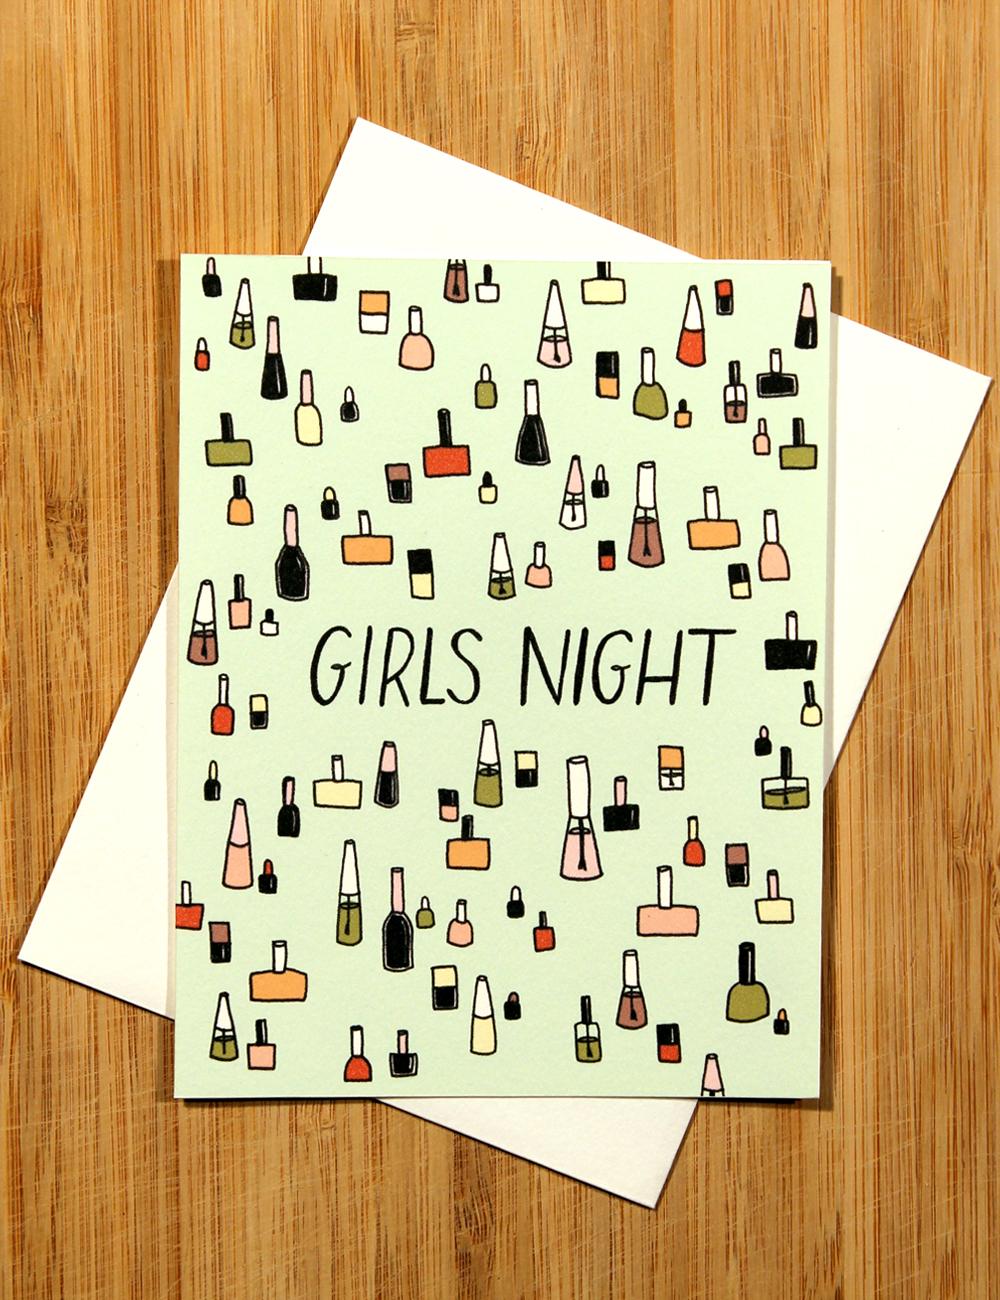 girlsnight.jpg